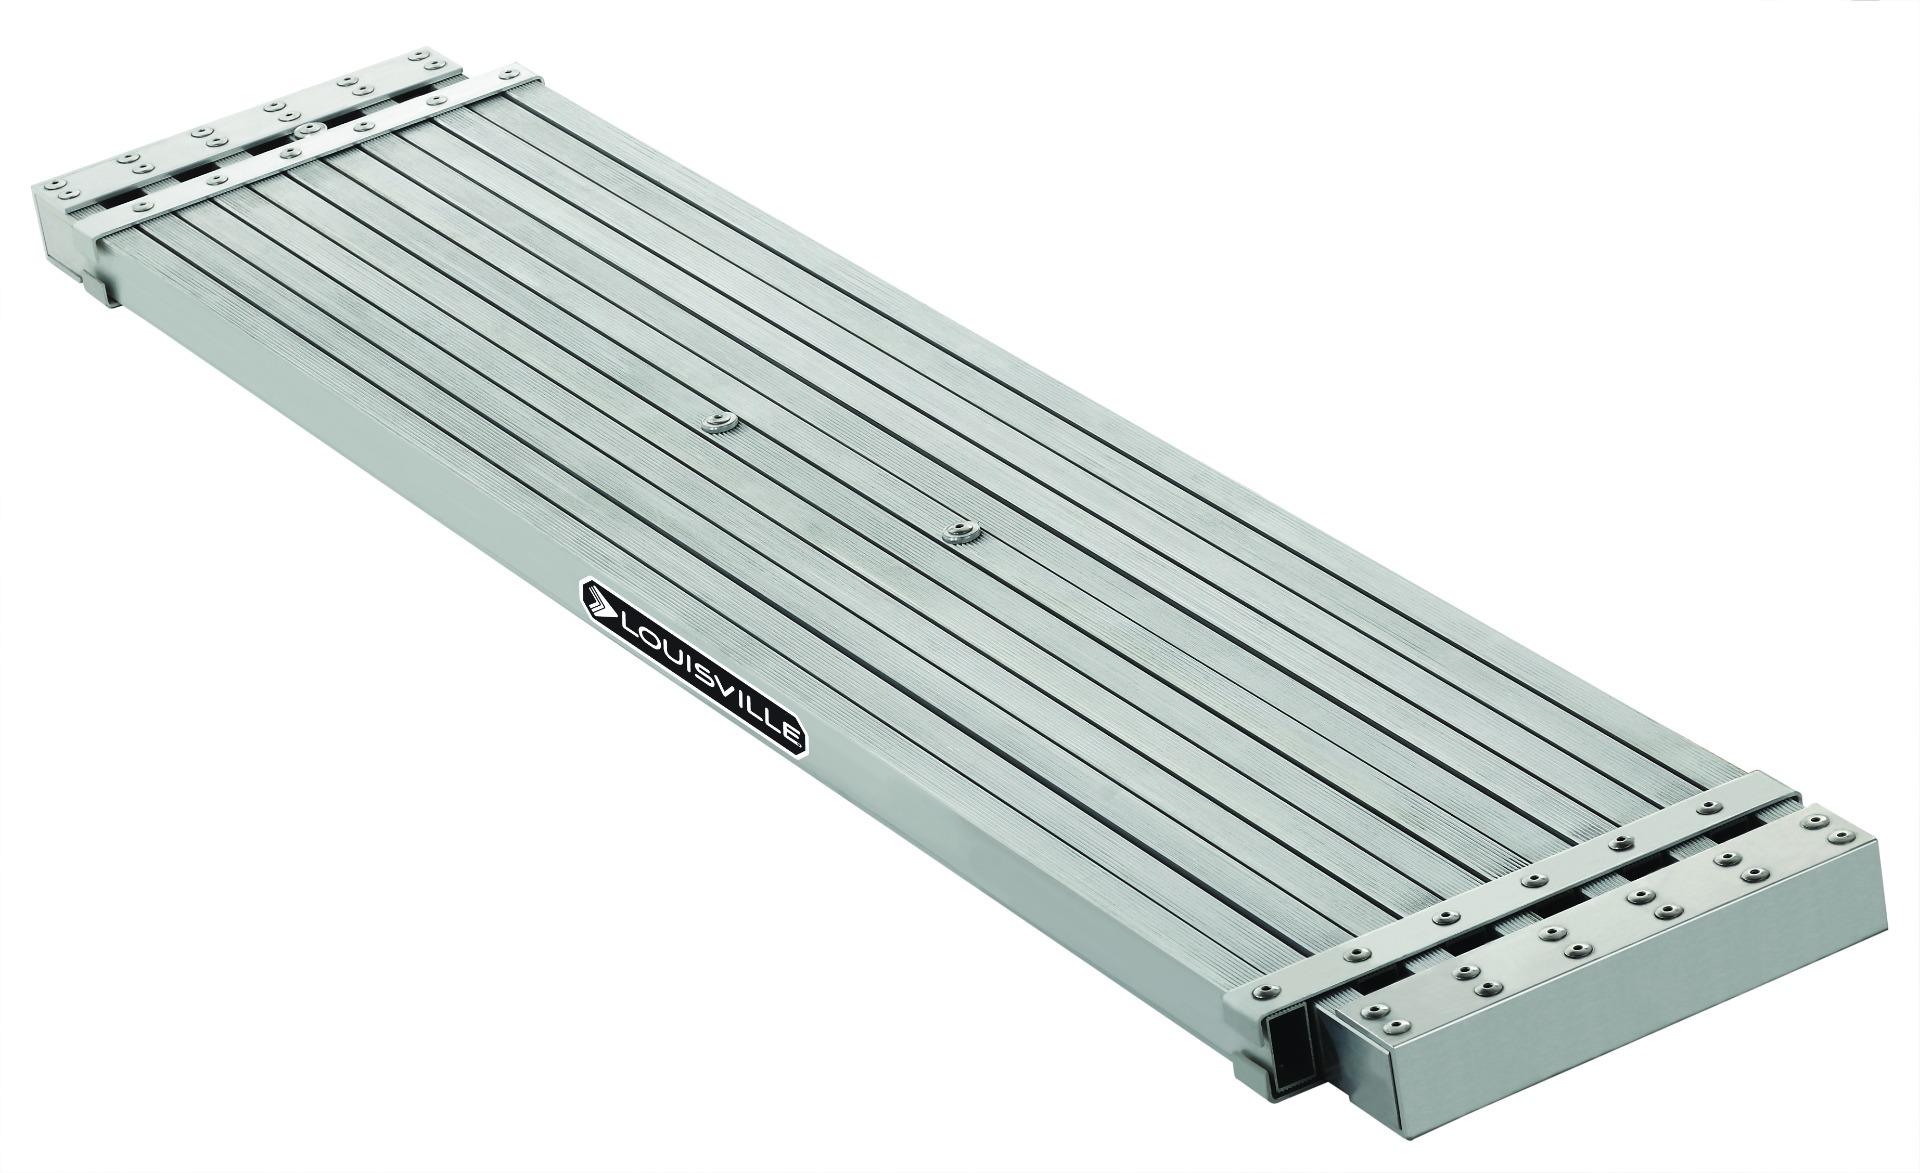 Louisville 16' Aluminium Medium-Duty Telescoping Plank 250lb. Rated